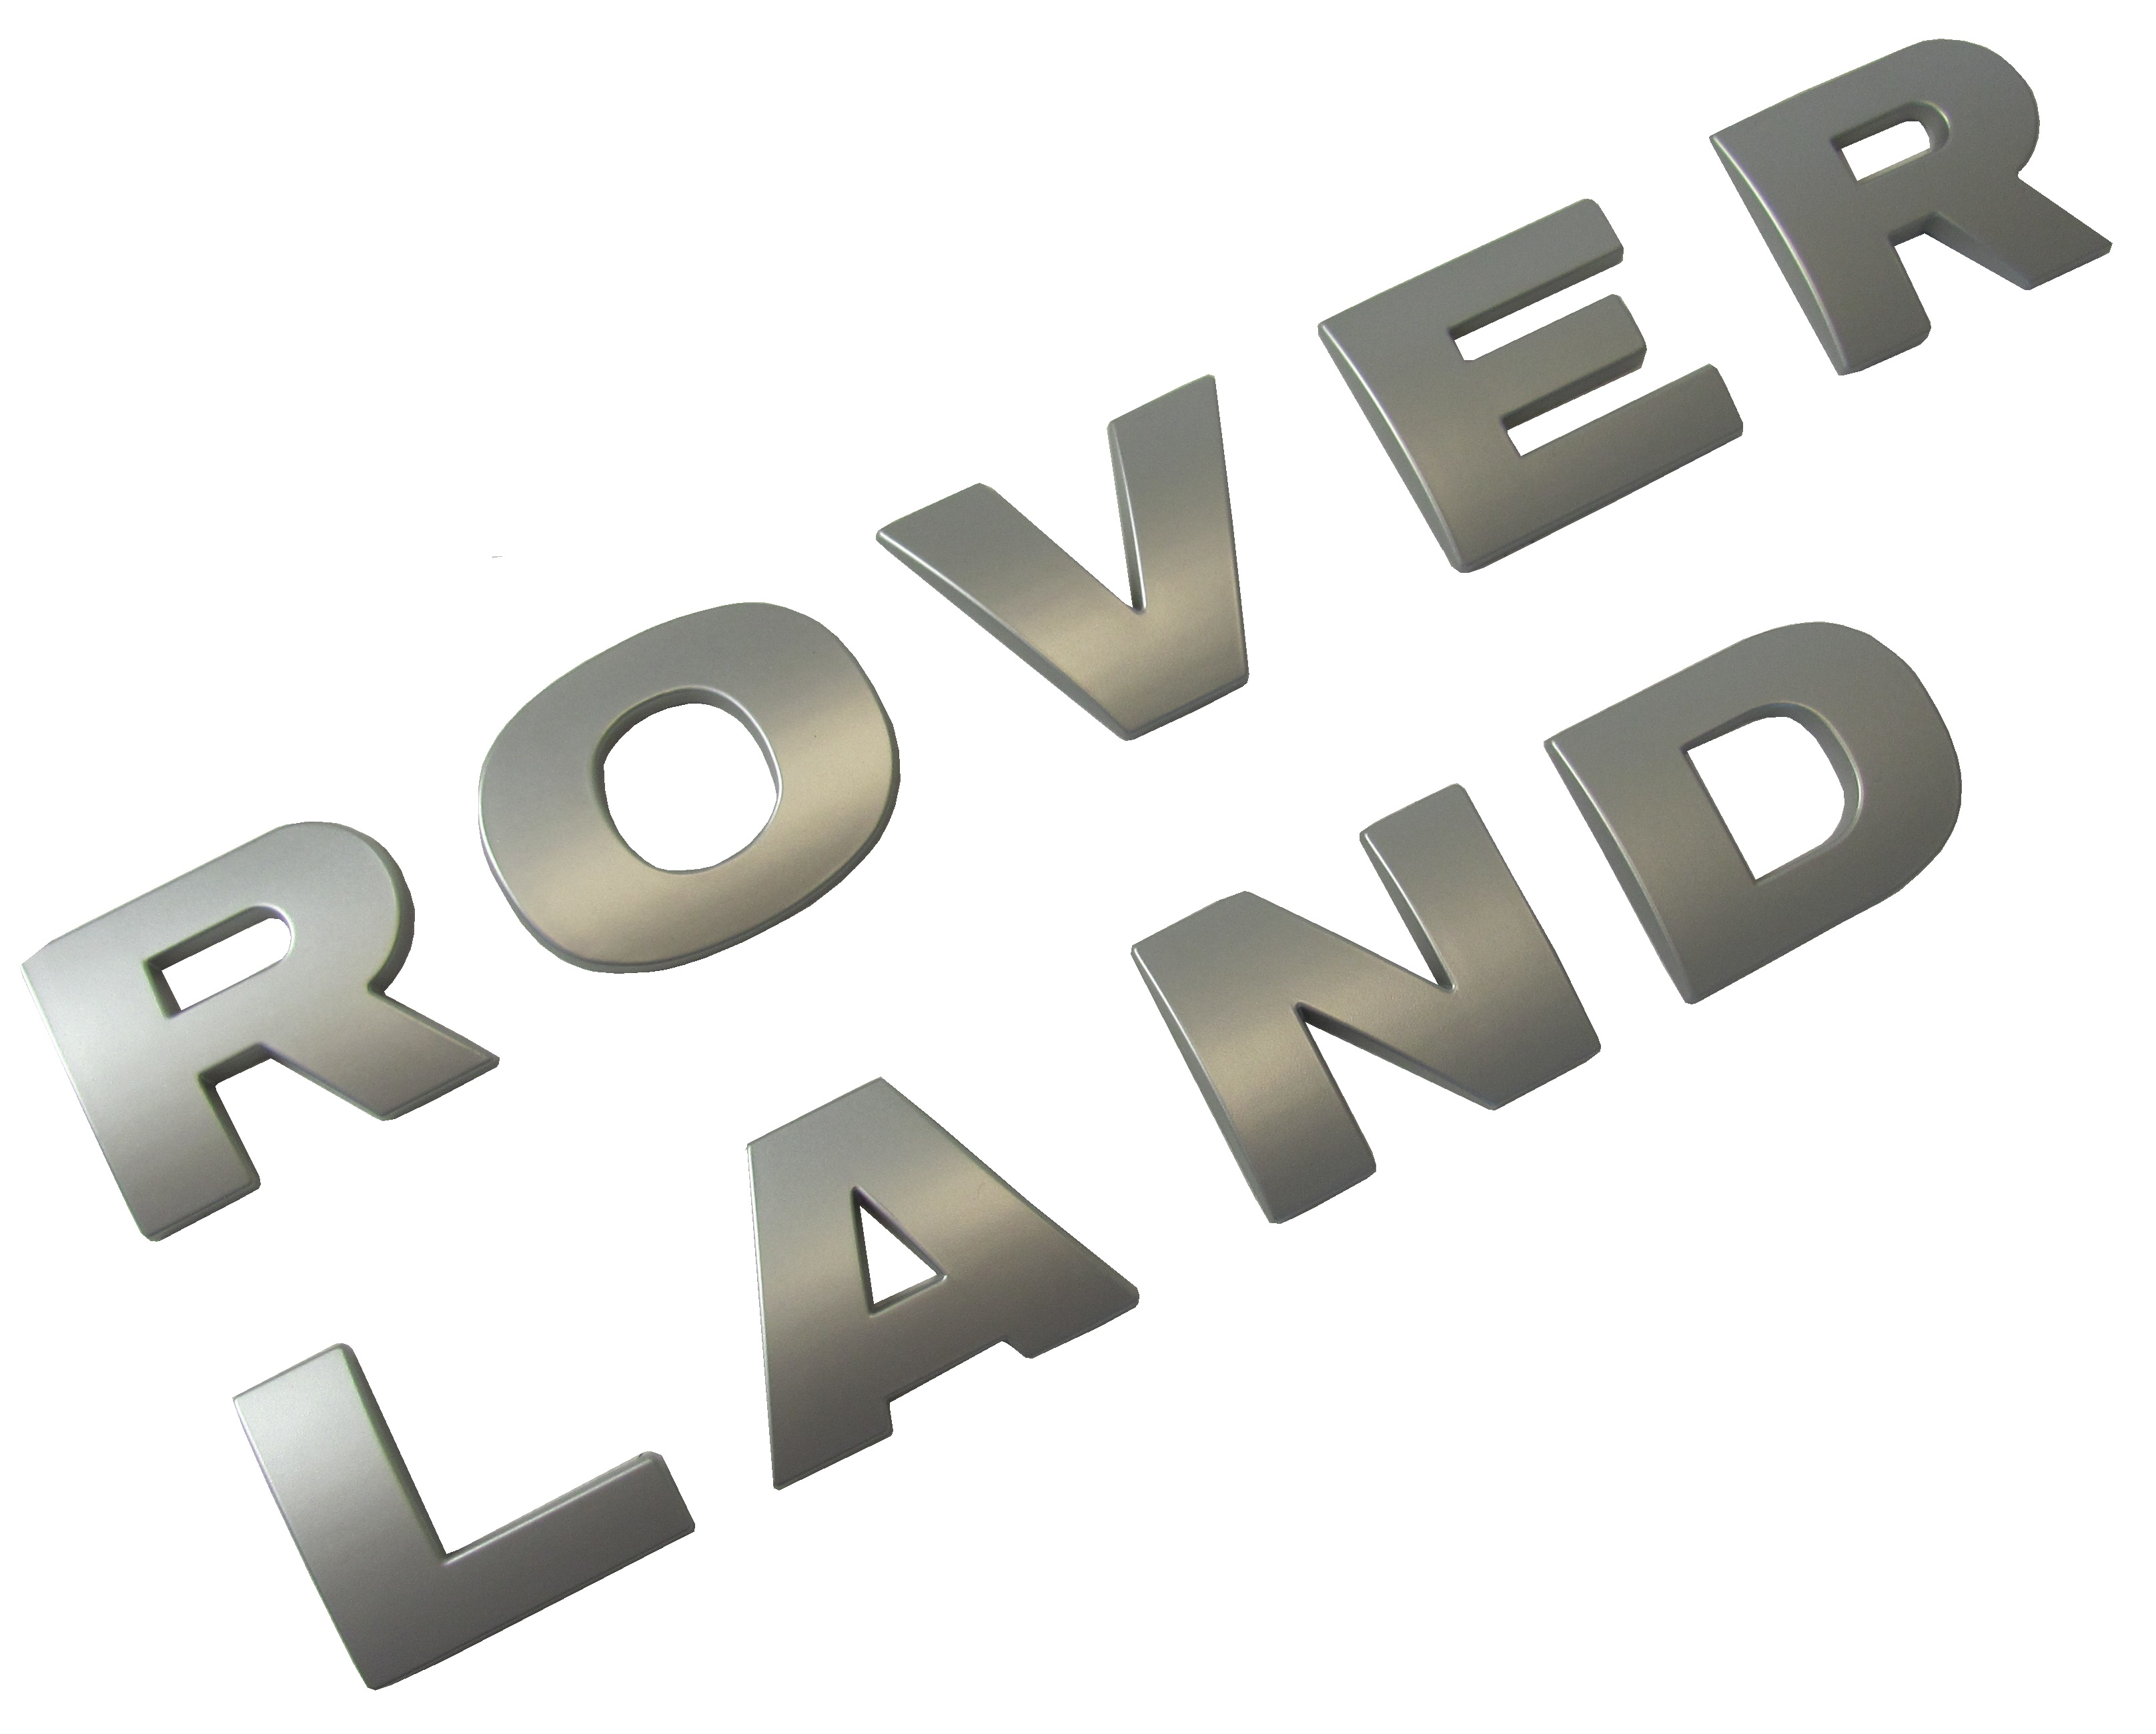 Silver Bon Lettering Silverland Jewelry Lakeside